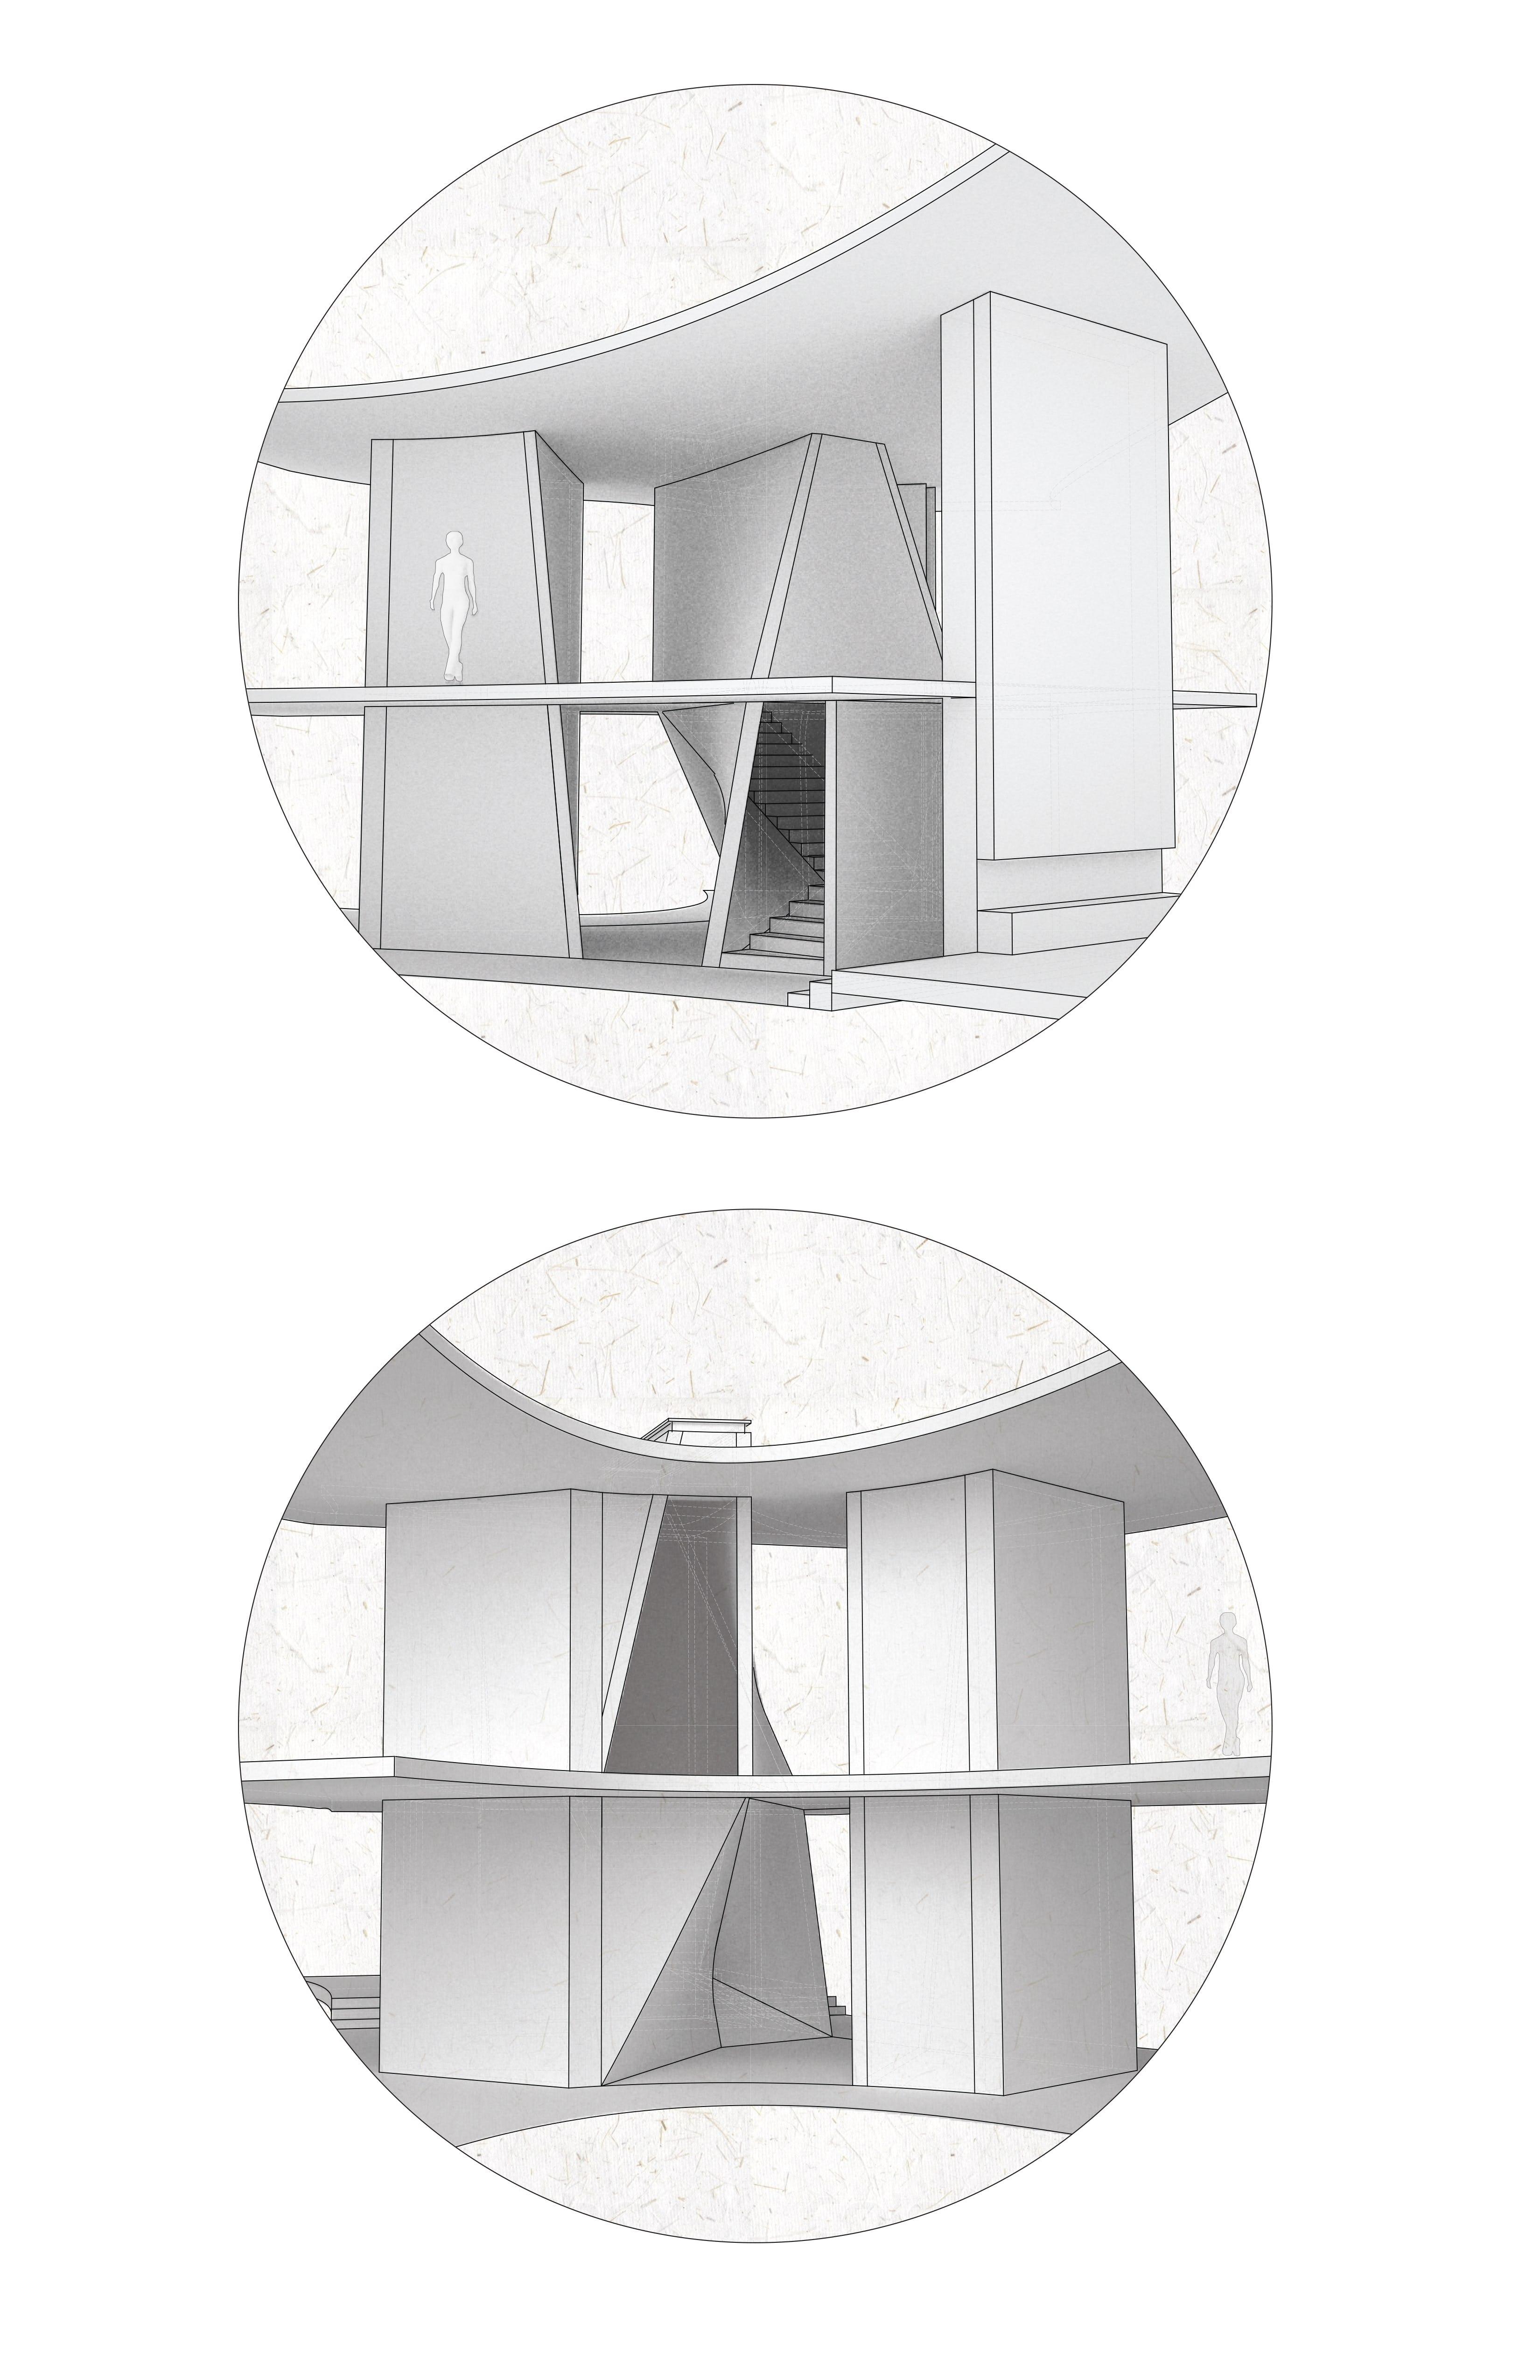 Courtyard house isoideas diagram 3